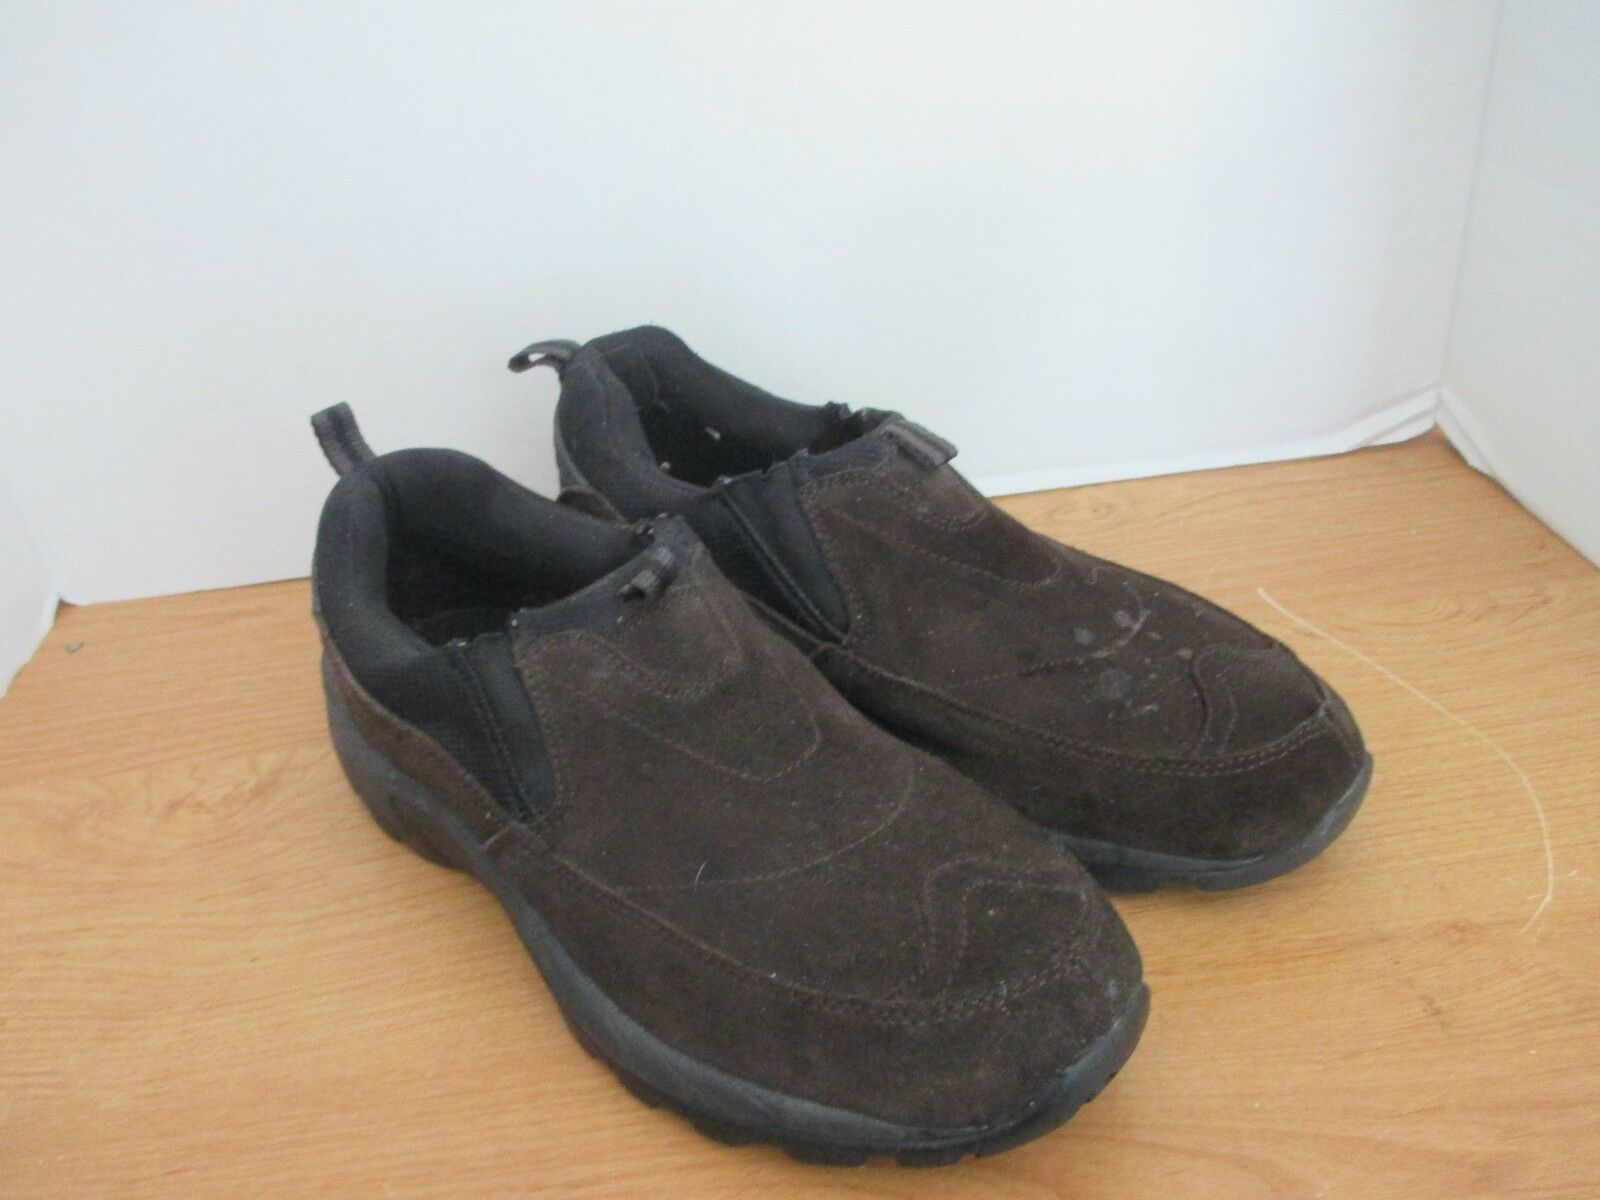 DENALI~Dark SLIP Brown Suede Leather SLIP DENALI~Dark ON CASUAL SHOES~Men's 9.5 091887